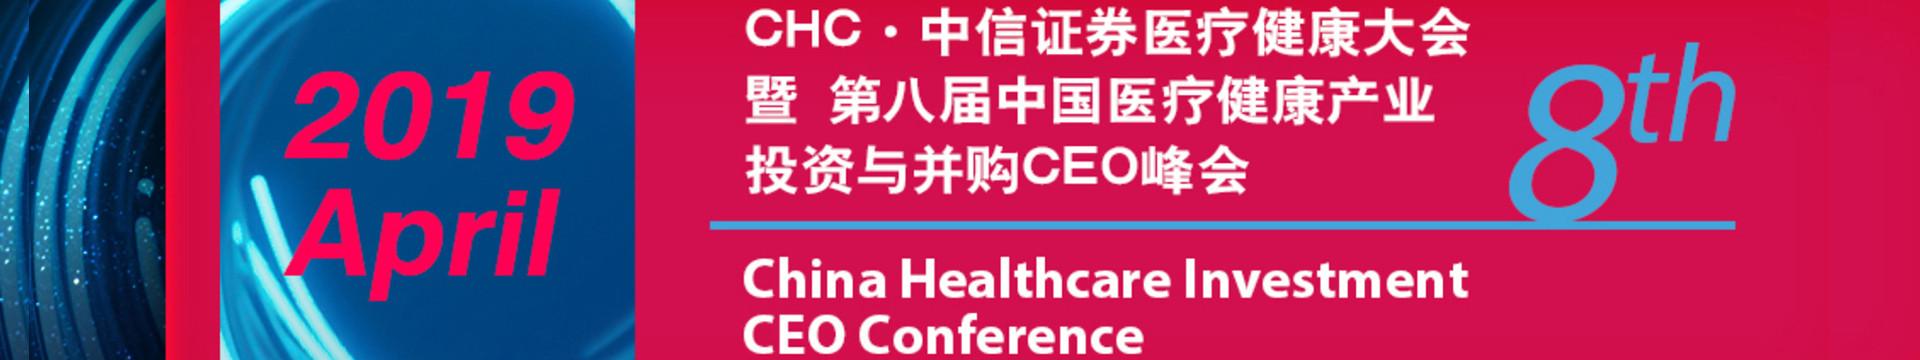 2019 CHC-中信证券医疗健康大会暨第八届中国医疗健康产业投资与并购CEO峰会(上海)